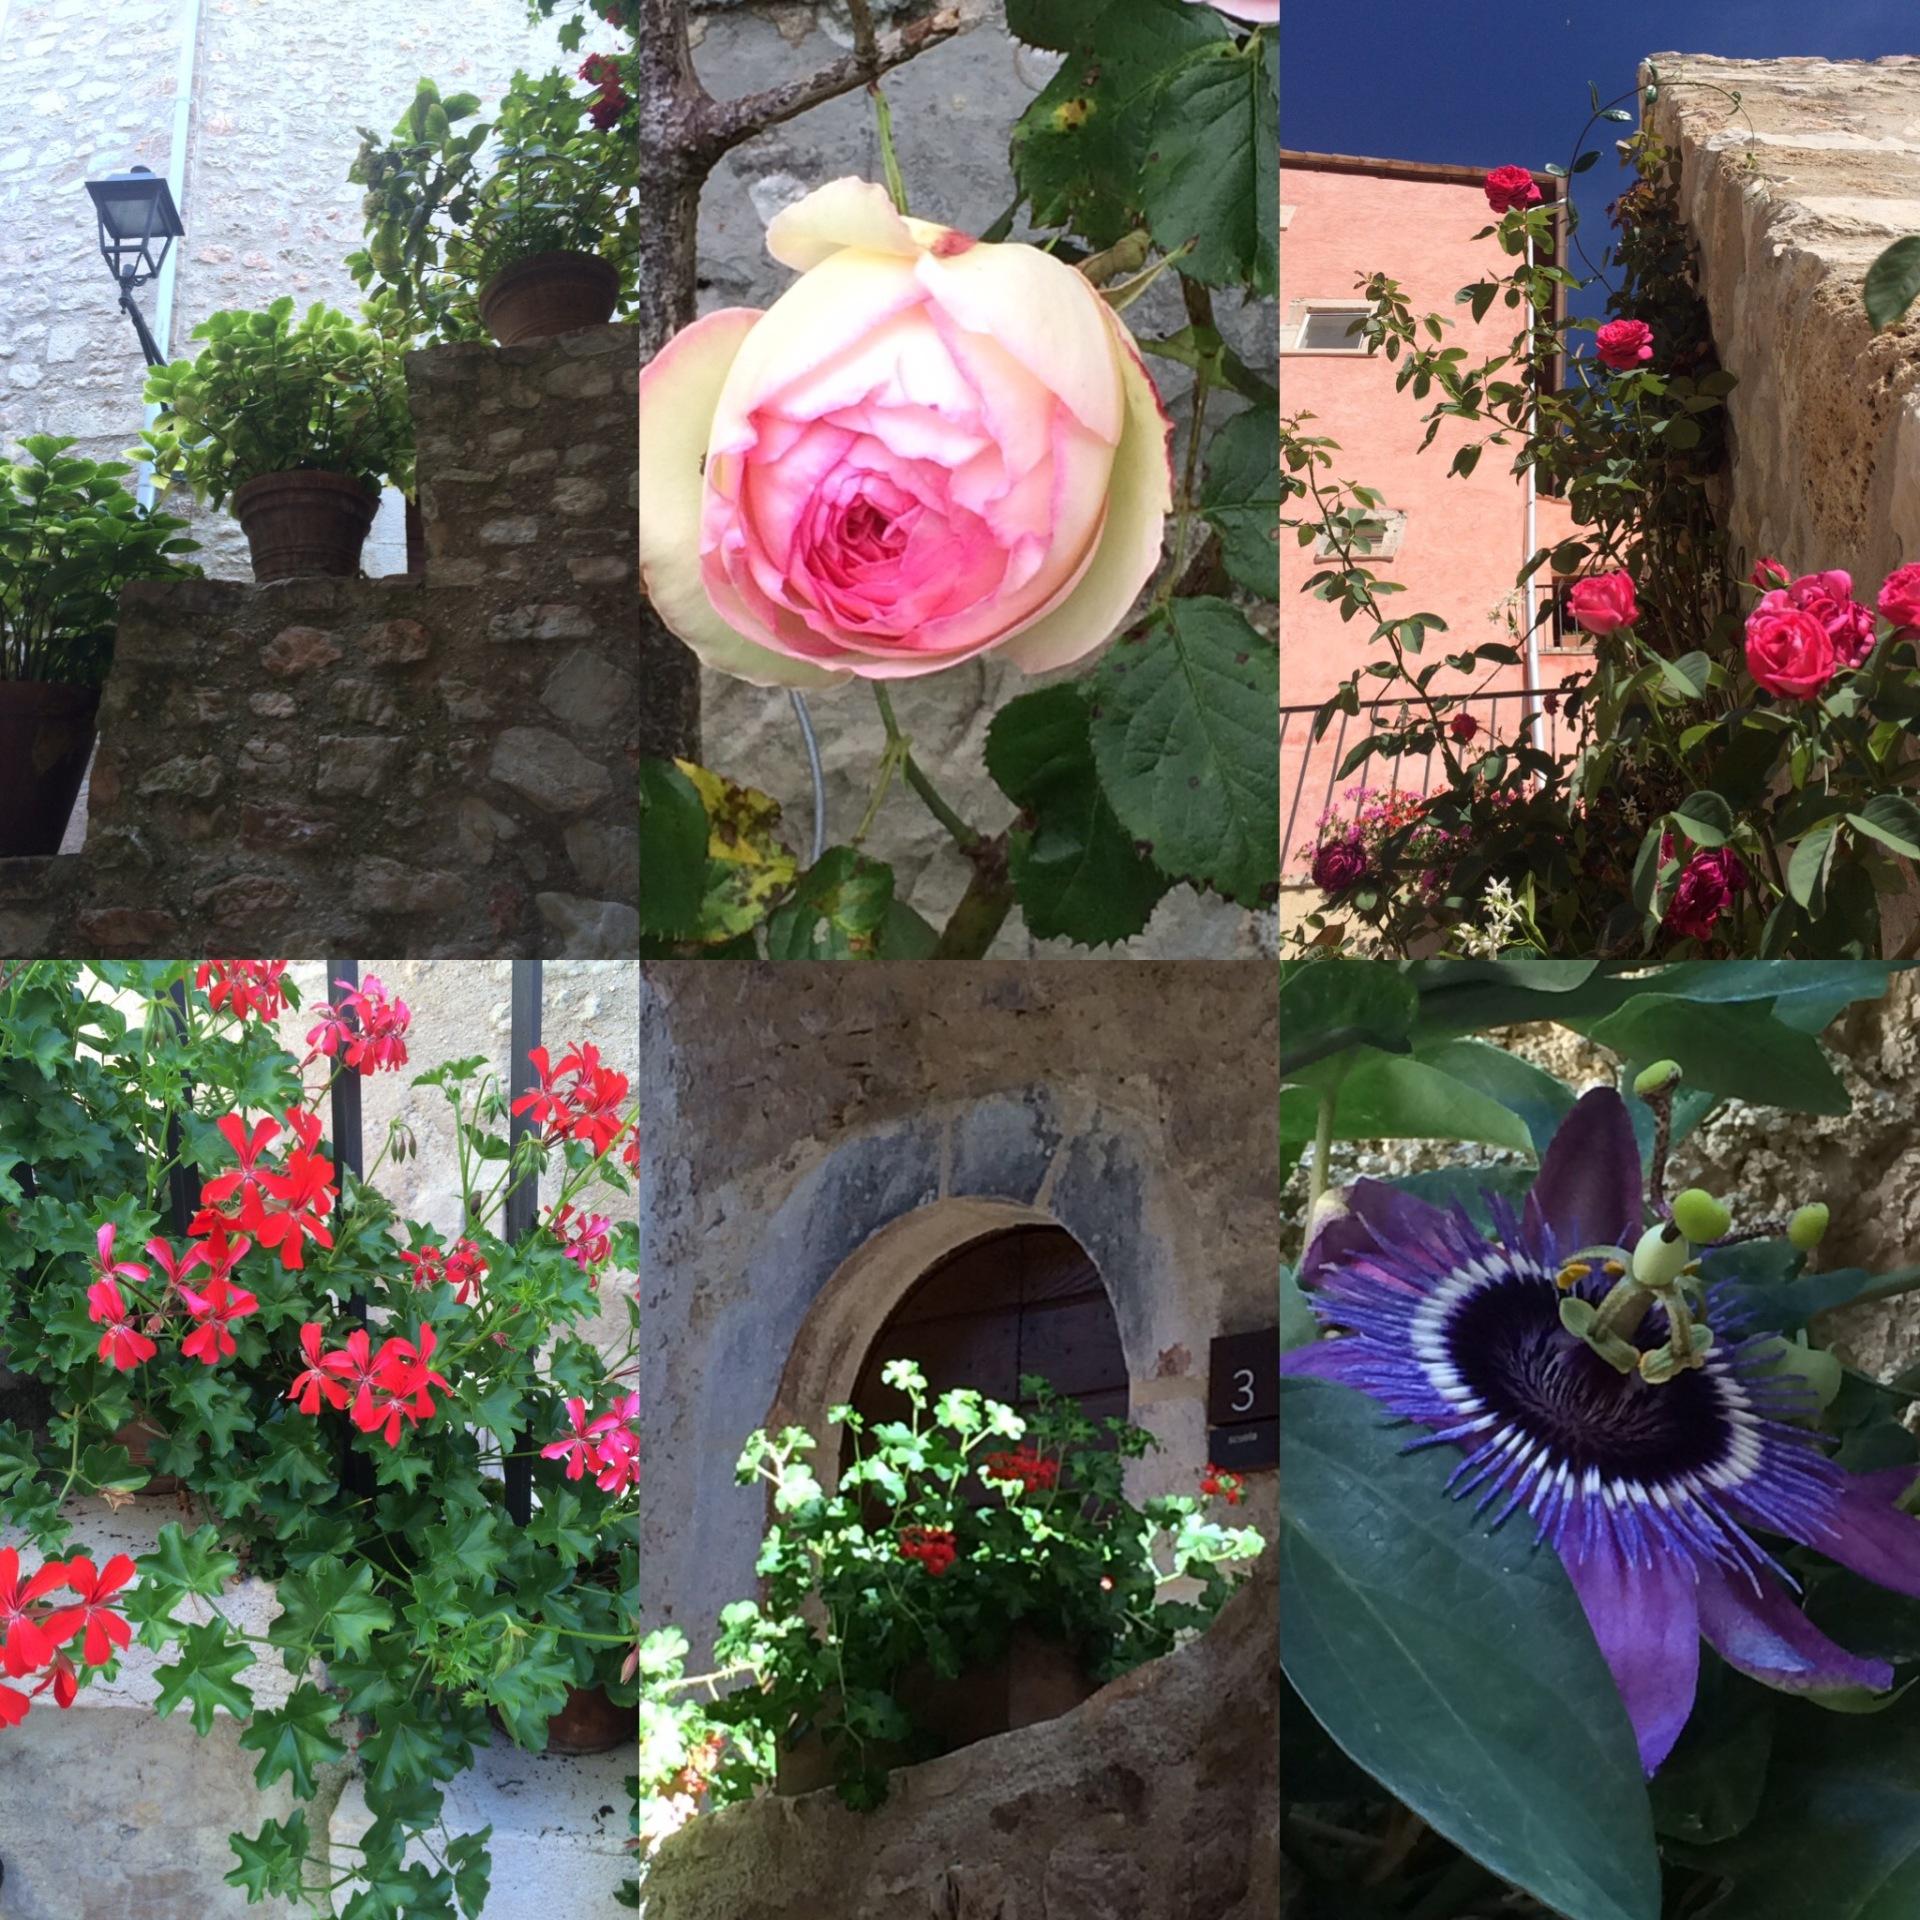 Postignano is beautifully planted